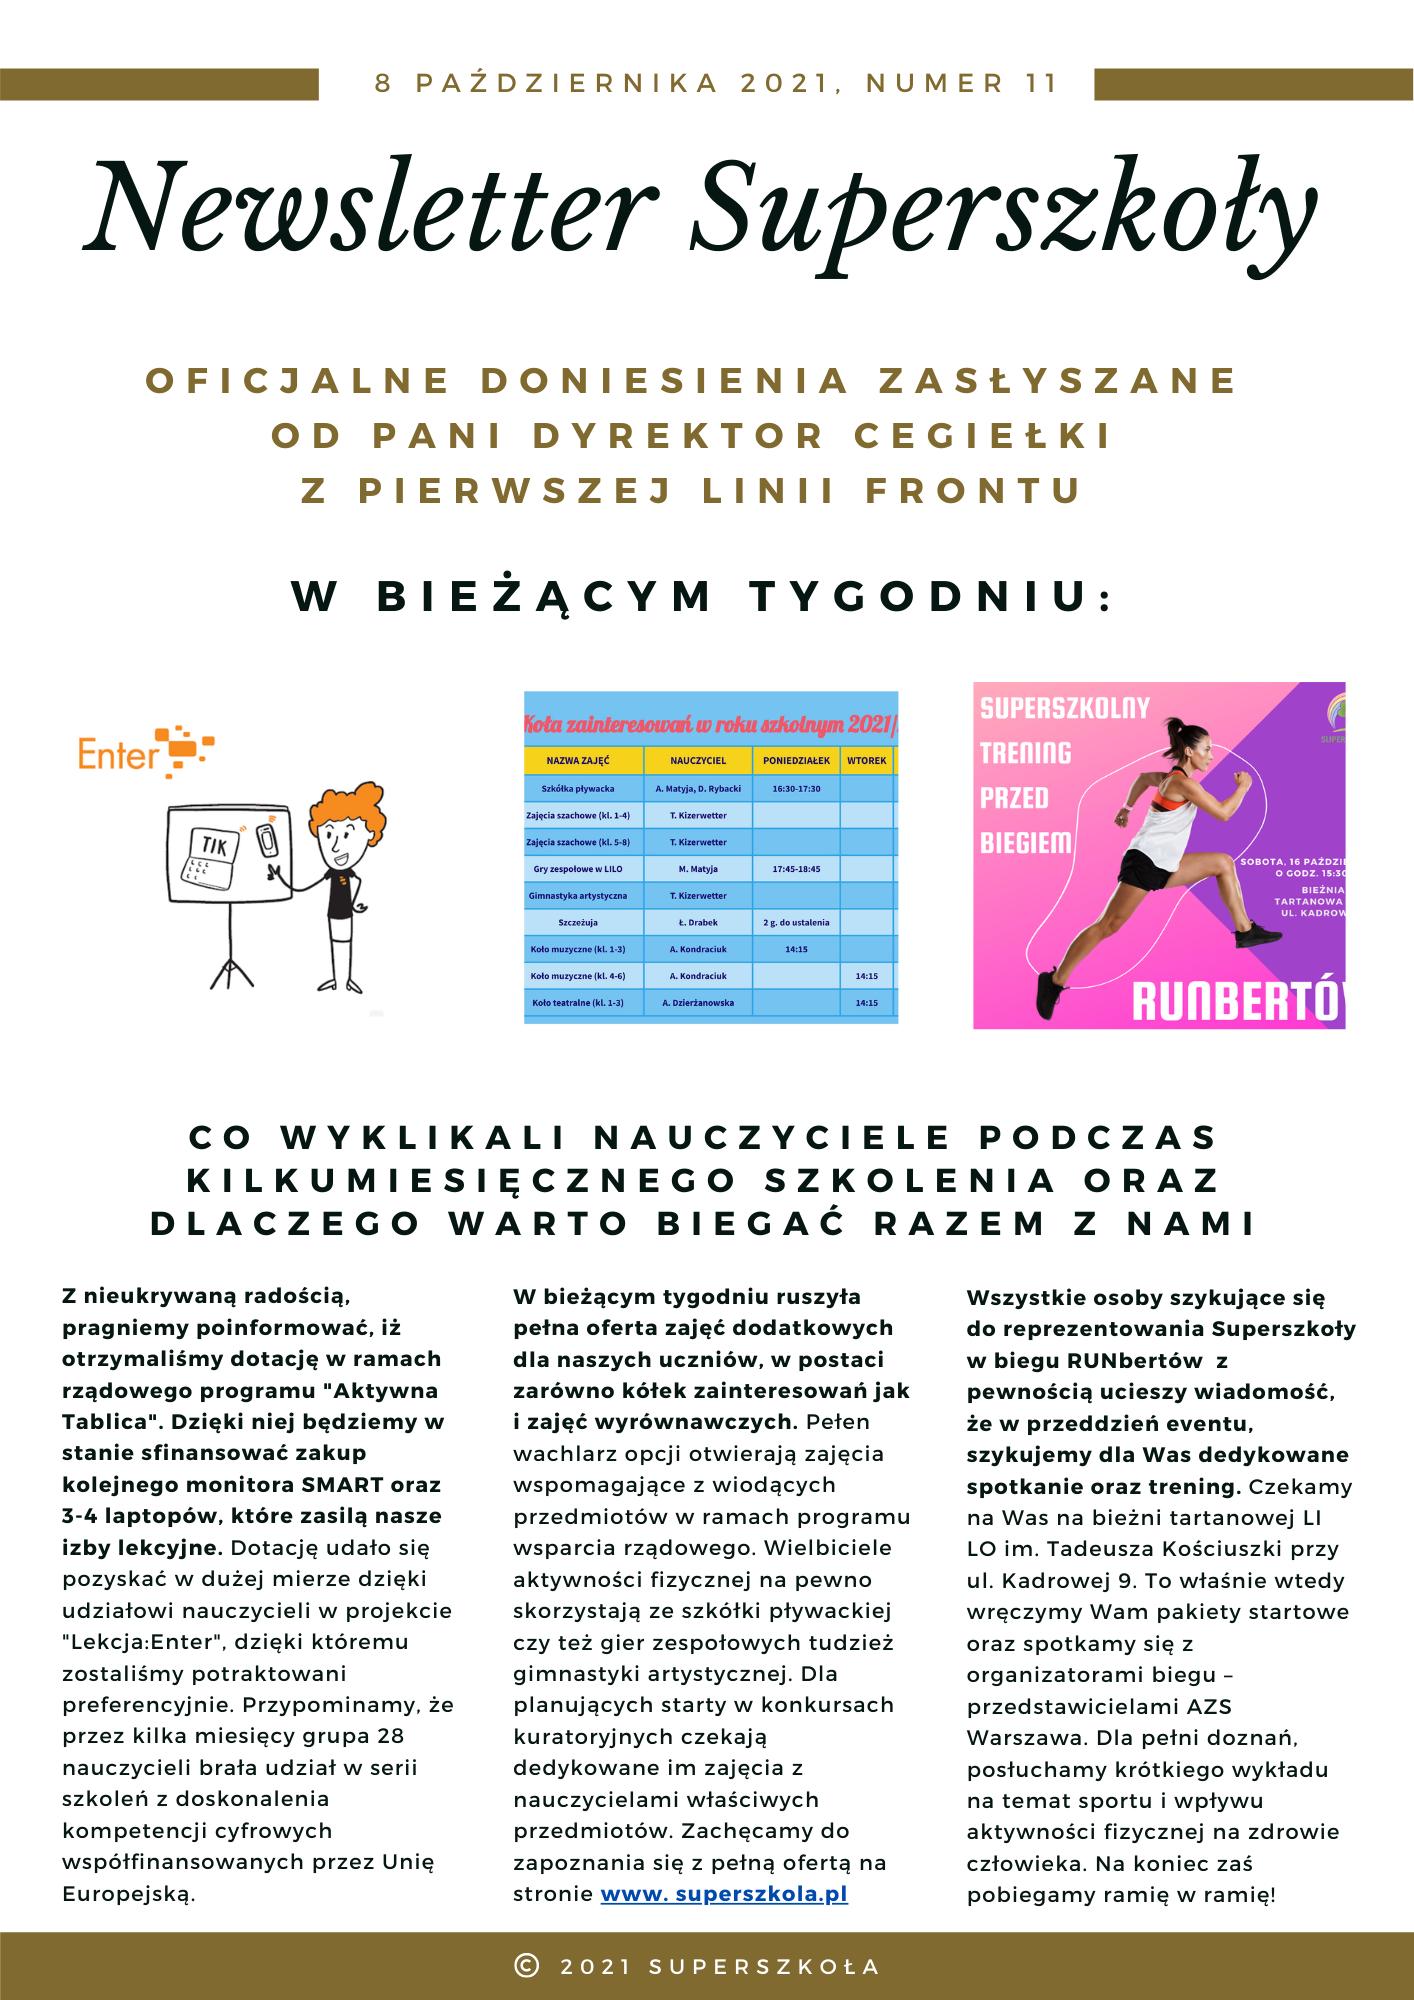 Newsletter_Superszkoły_11